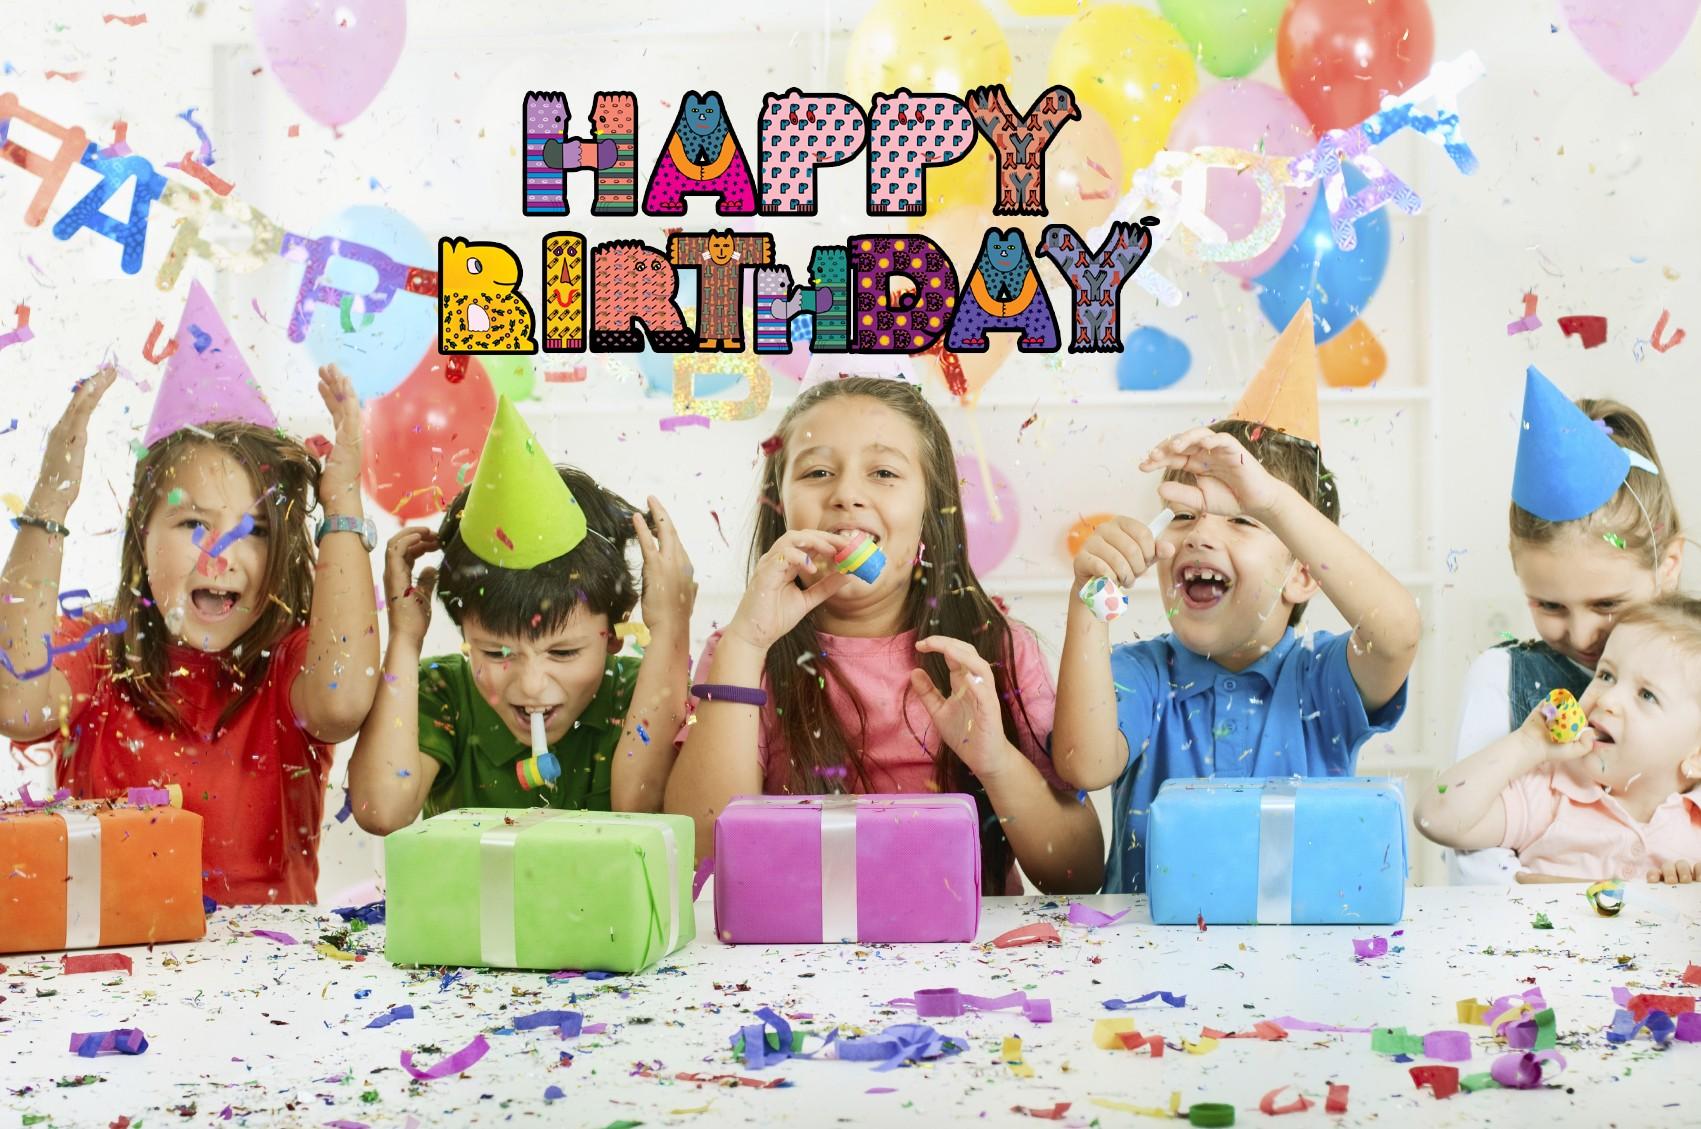 happy birthday images child - happy birthday images child - Wallpapers, hd-wallpapers, HD, Free, Birthday, 4k-wallpapers, 4k